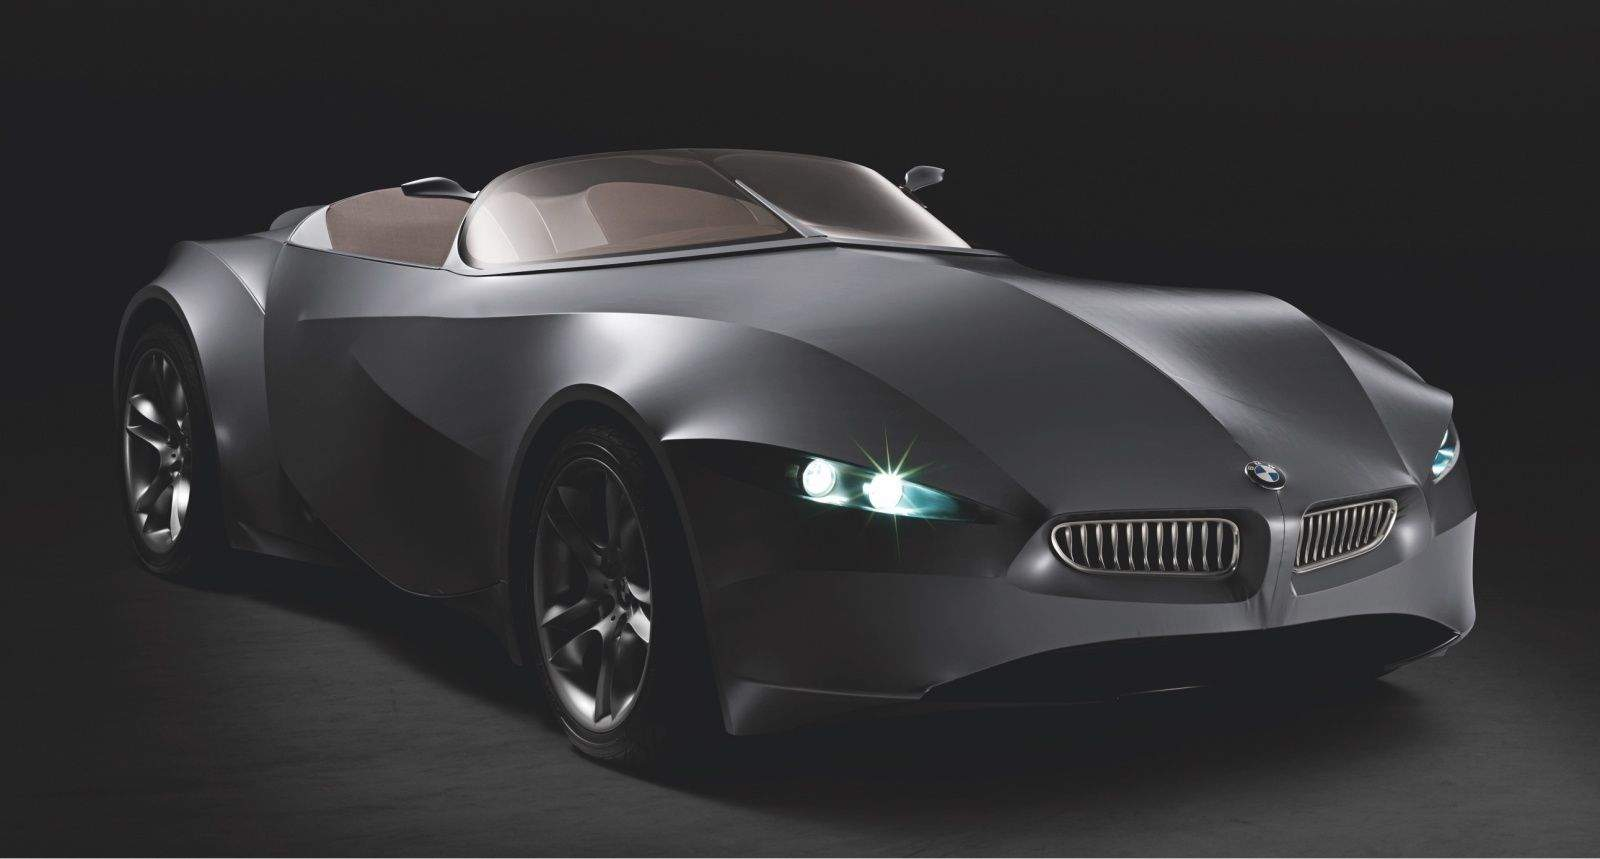 Exotic Car Wallpaper Iphone Apple Car Cupertino S Got The Design Talent To Transform